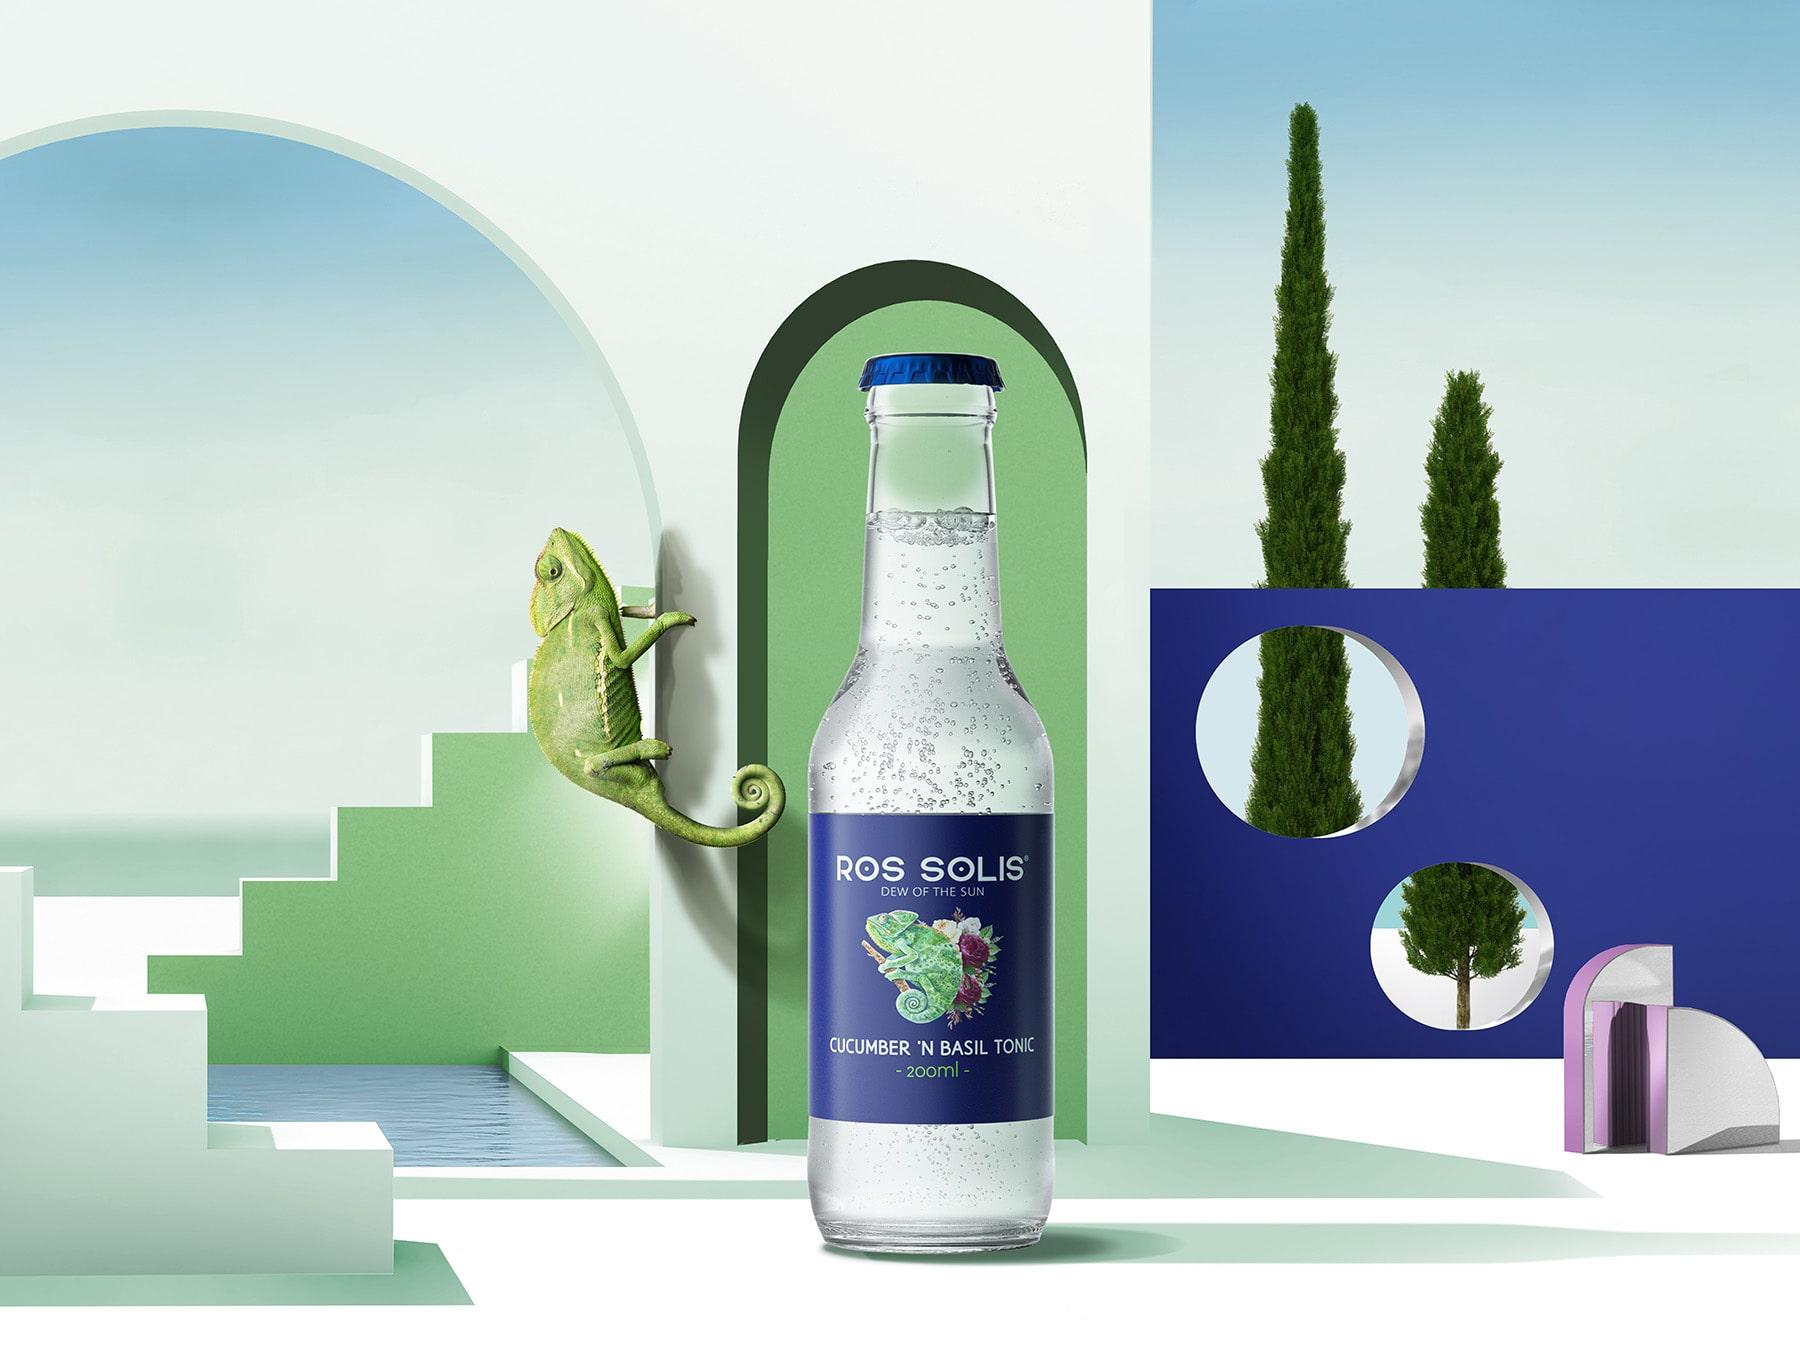 Cucumber-n-basil-tonic